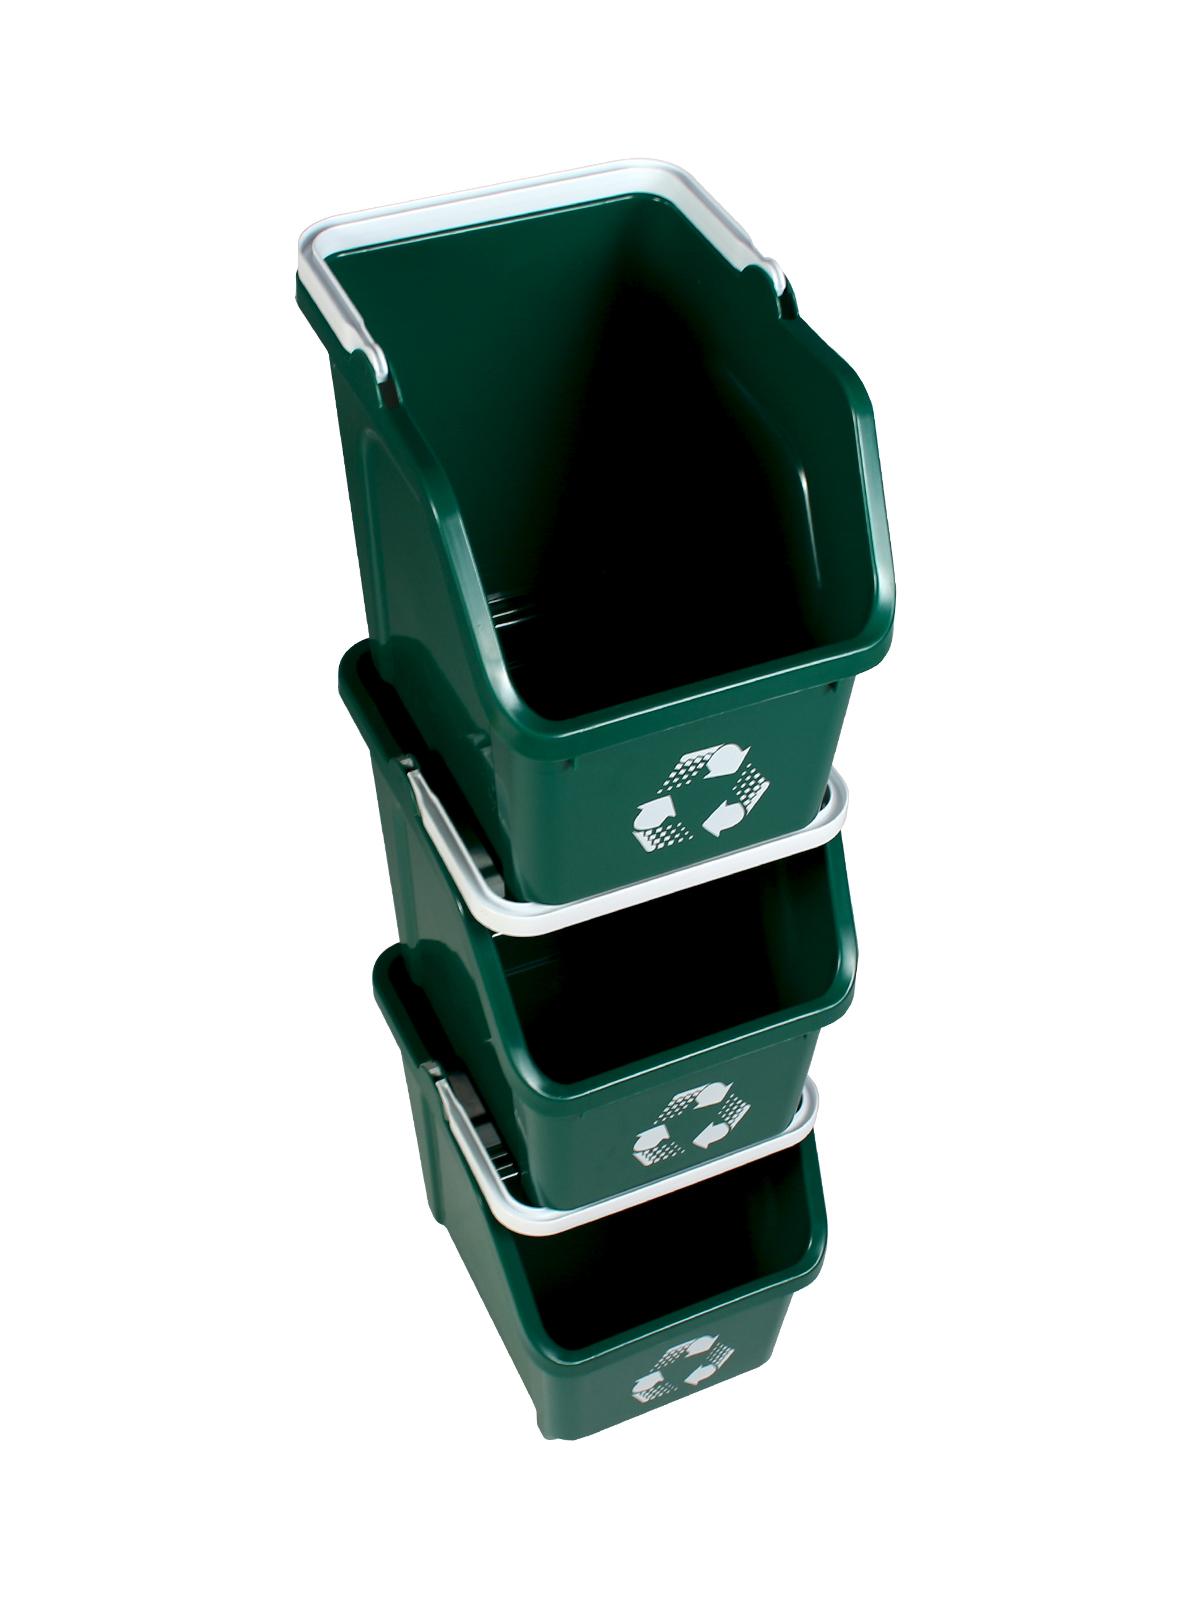 MULTI RECYCLER (20 Pack) - Single - Mobius Loop - Full - Green